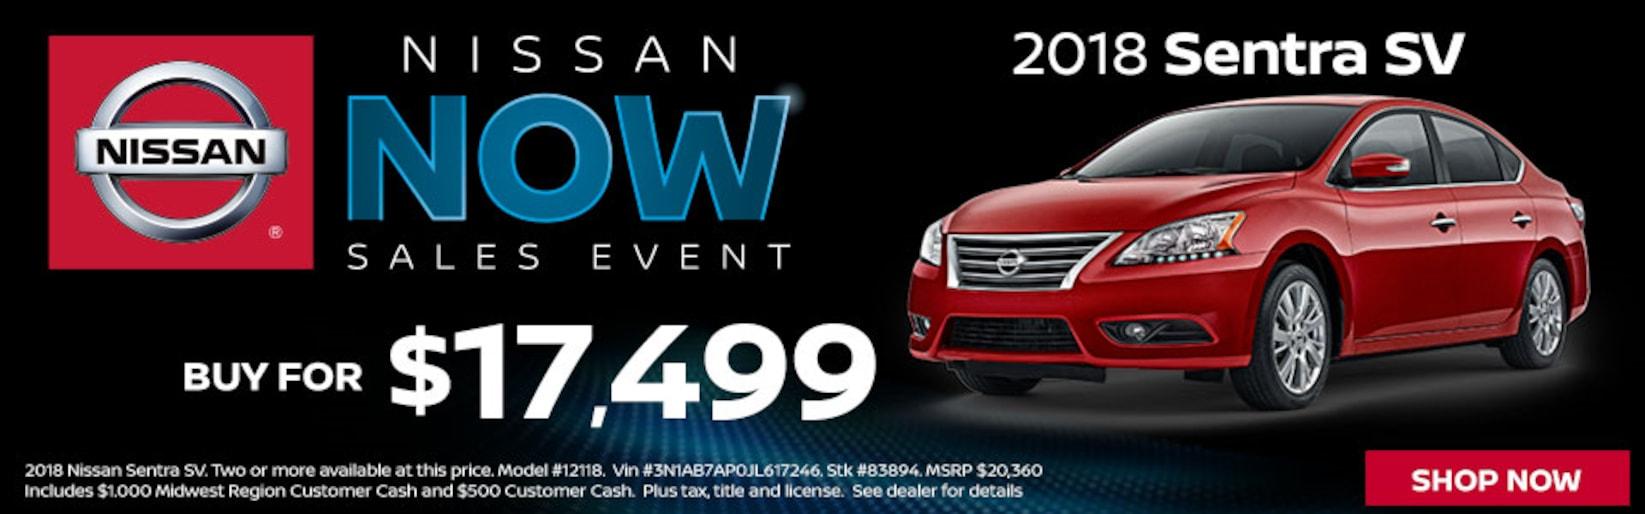 Car Dealerships In Henderson Ky >> Nissan Dealership | Used Cars For Sale Evansville IN | D ...